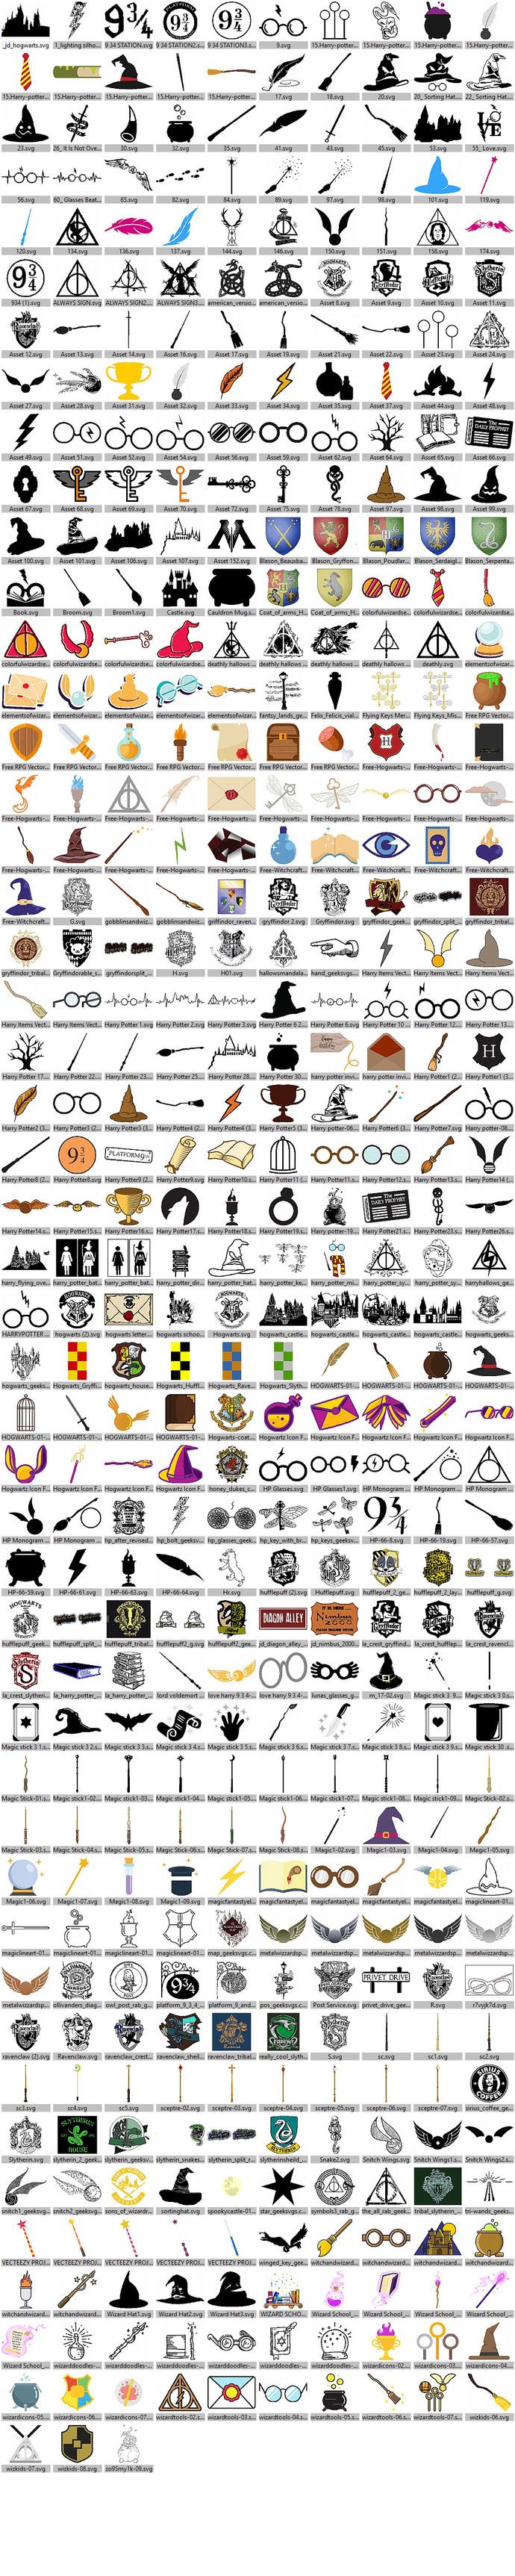 Harry P. Clipart Vector Art, Symbols and Logos